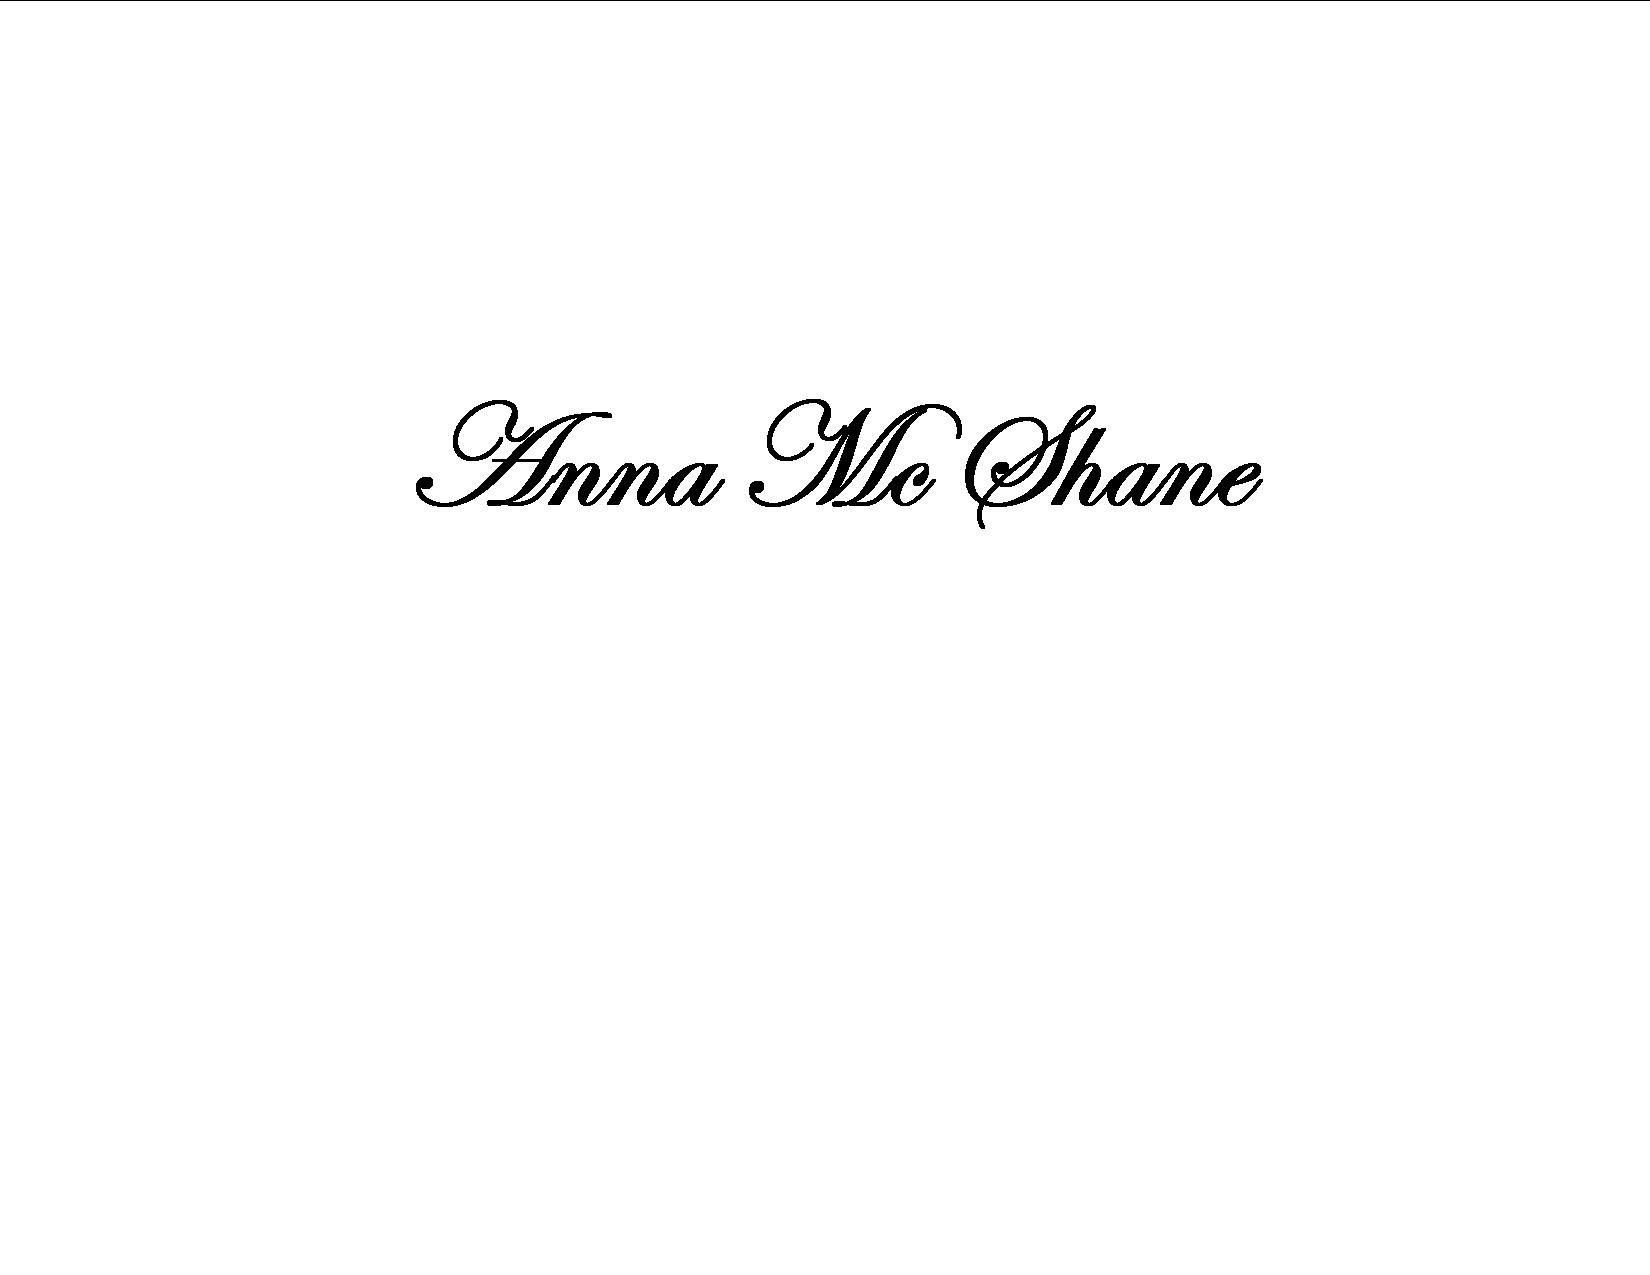 Anna Mc Shane Signature